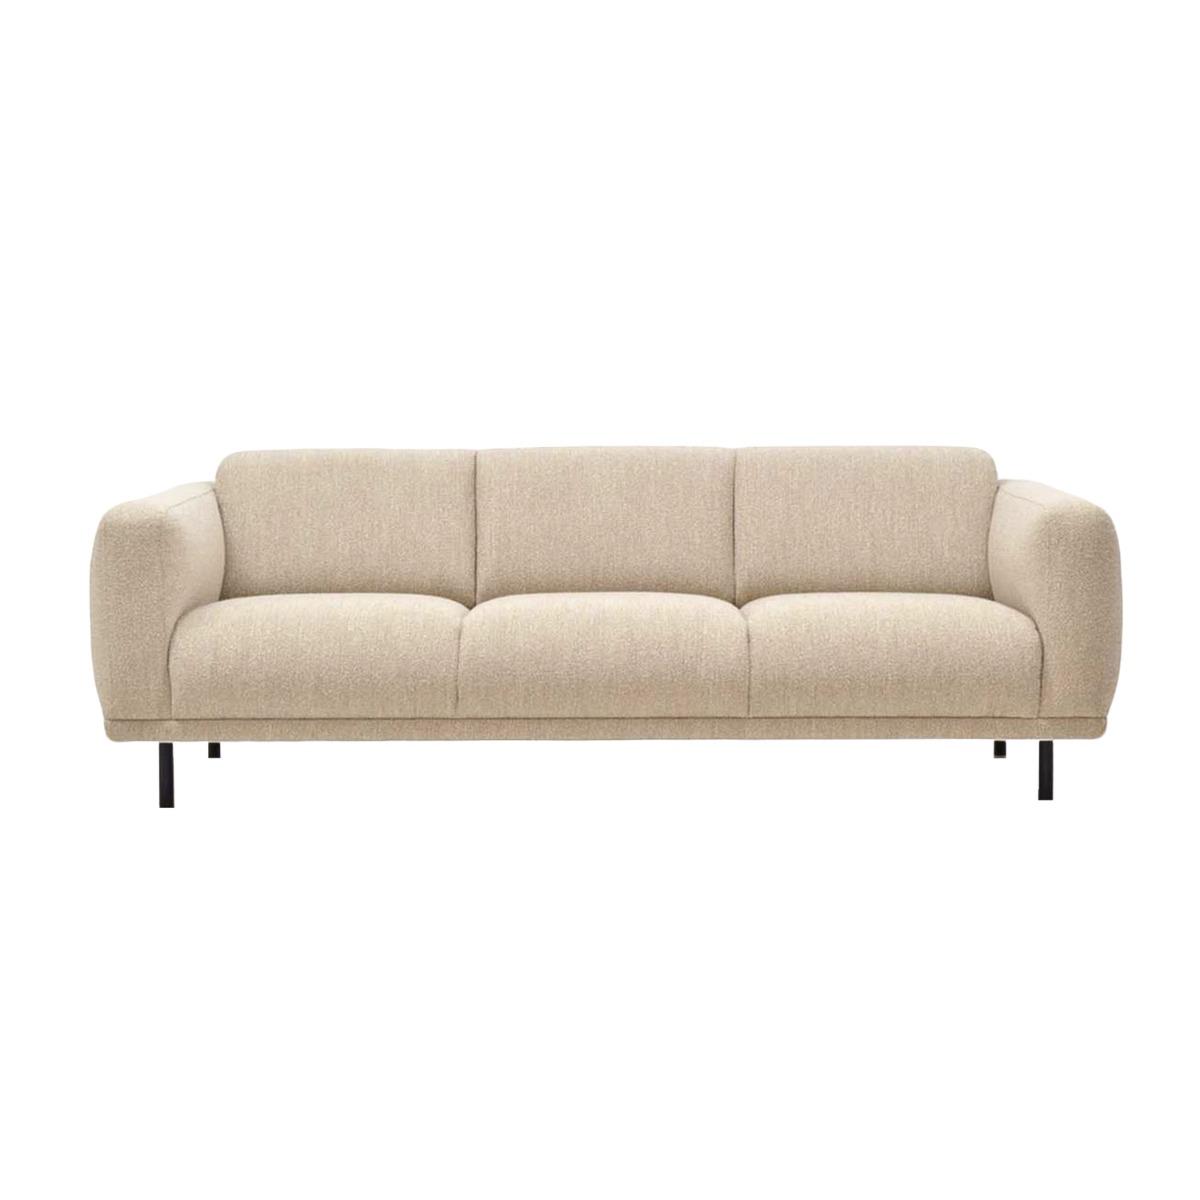 Teddy sofa XL Pols Potten - Beige